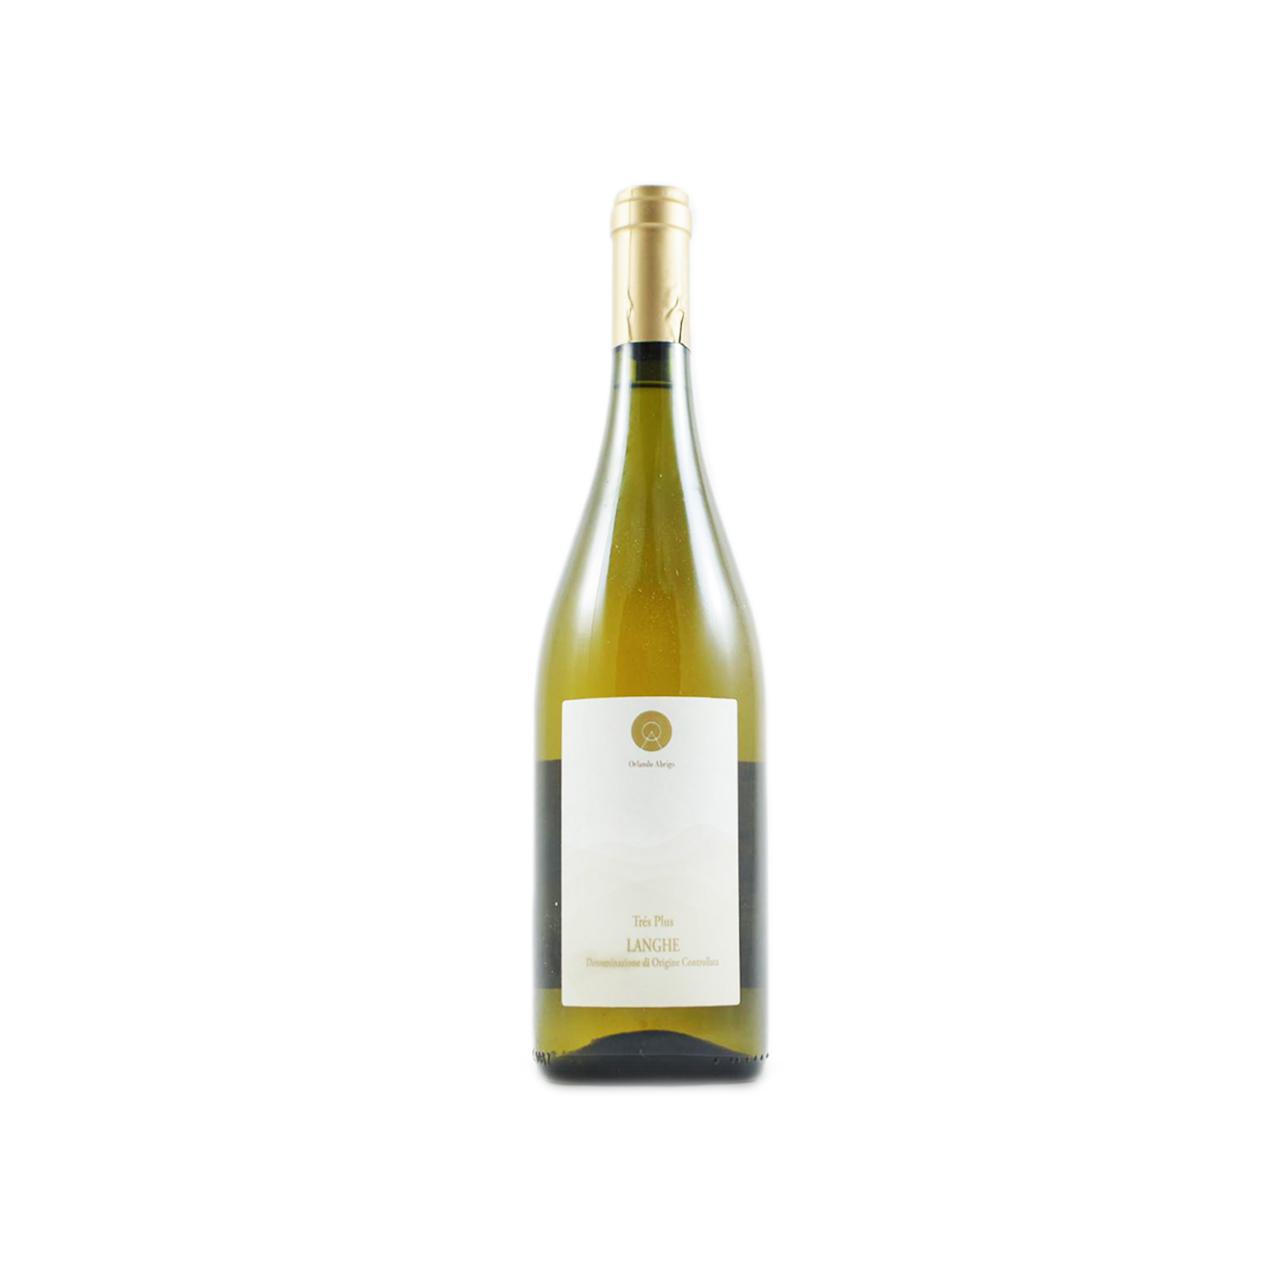 Langhe Chardonnay 2011